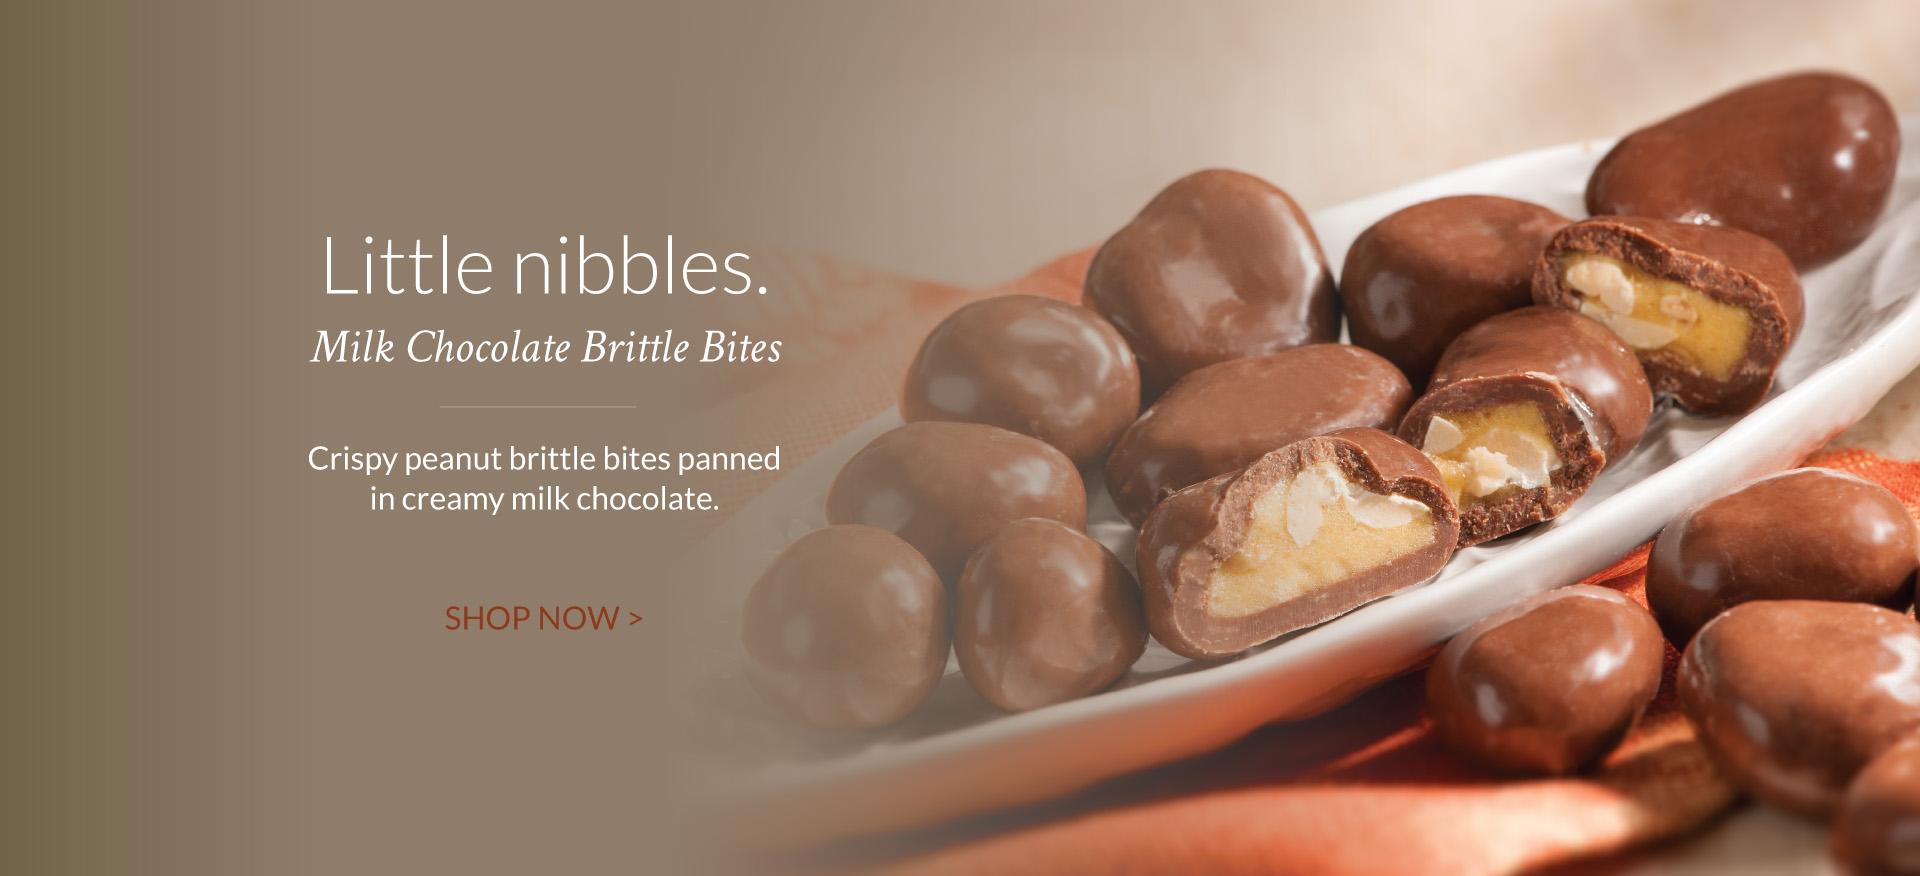 Milk Chocolate Brittle Bites - The Peanut Shop of Williamsburg